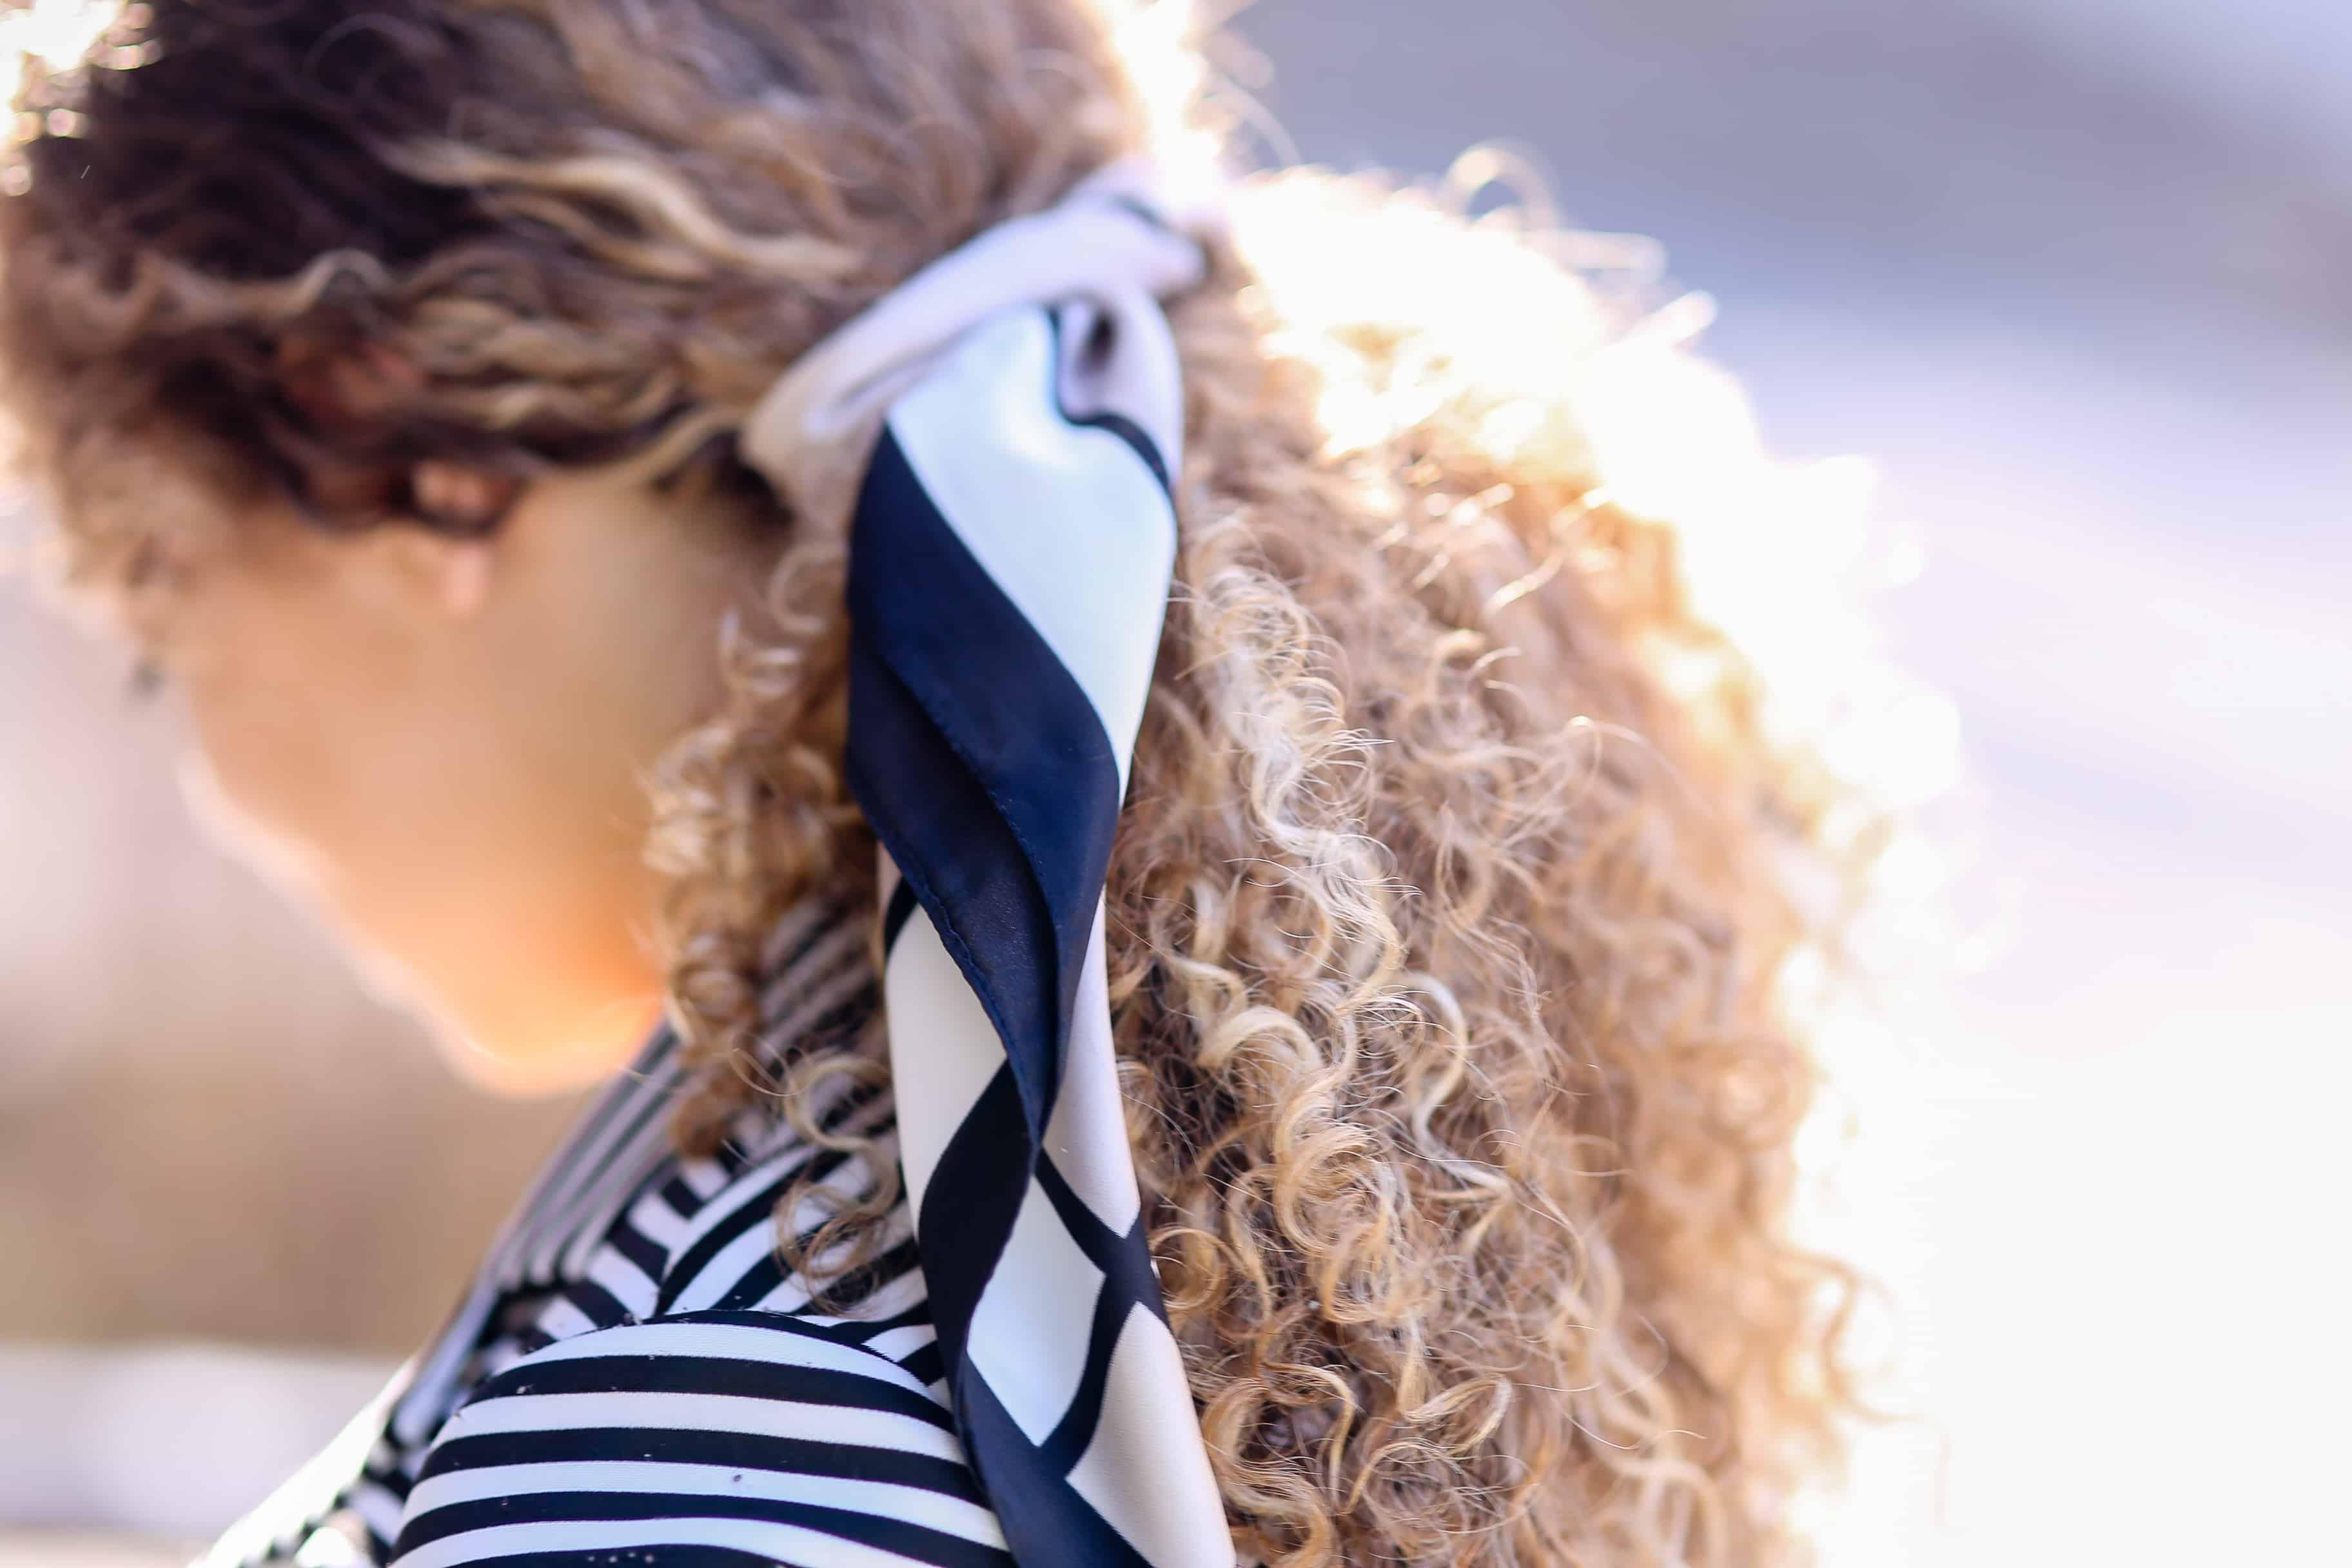 satin scarf in hair